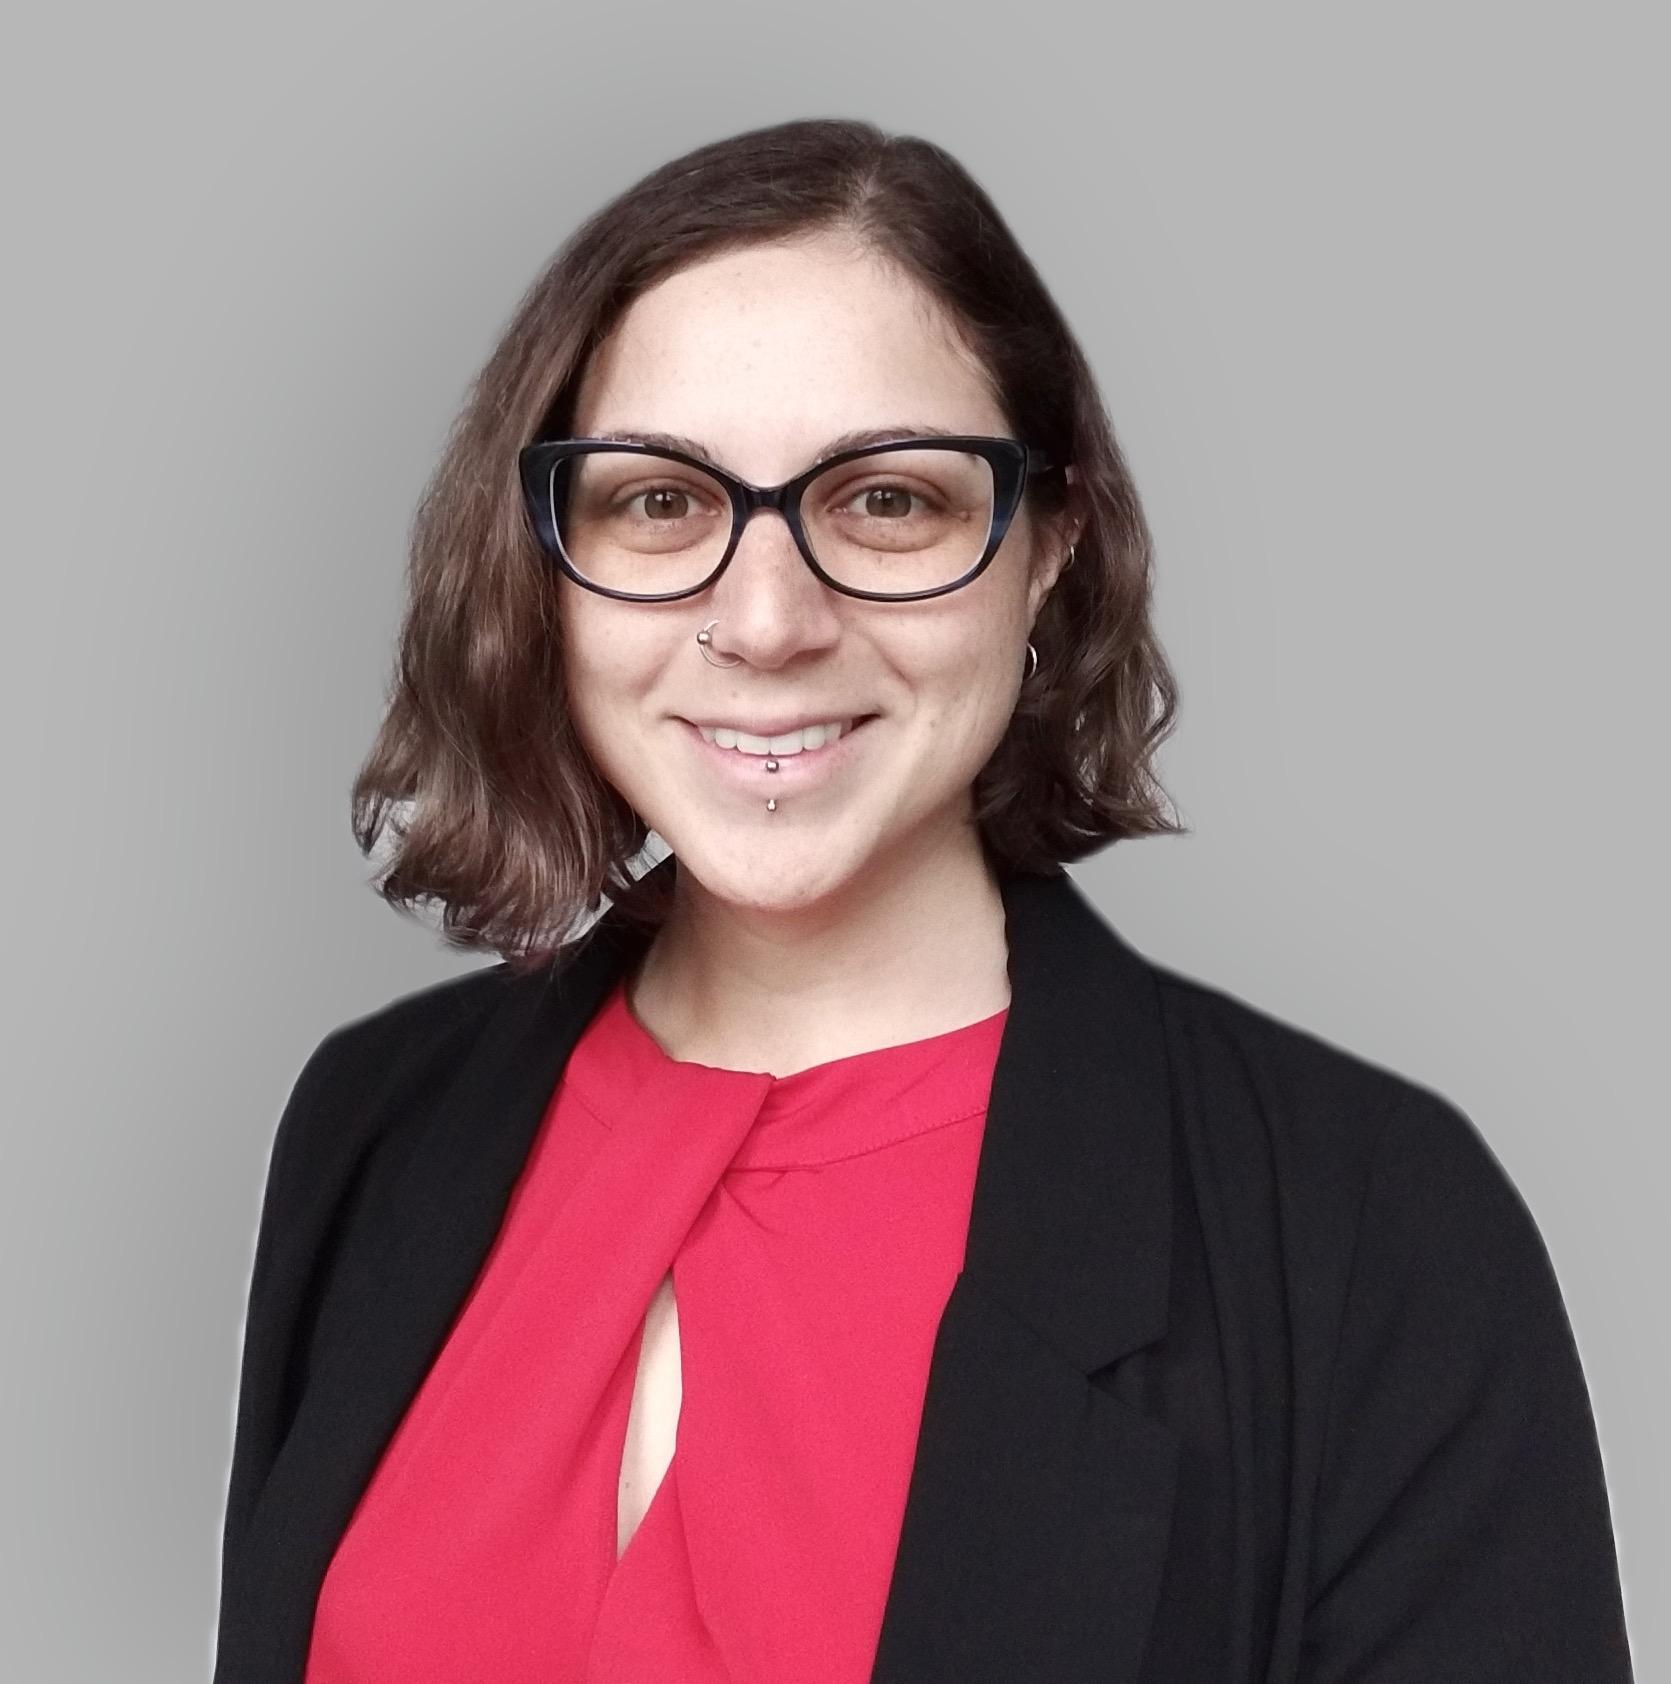 Jessica Murray, Broadmeadow, NSW, ORS